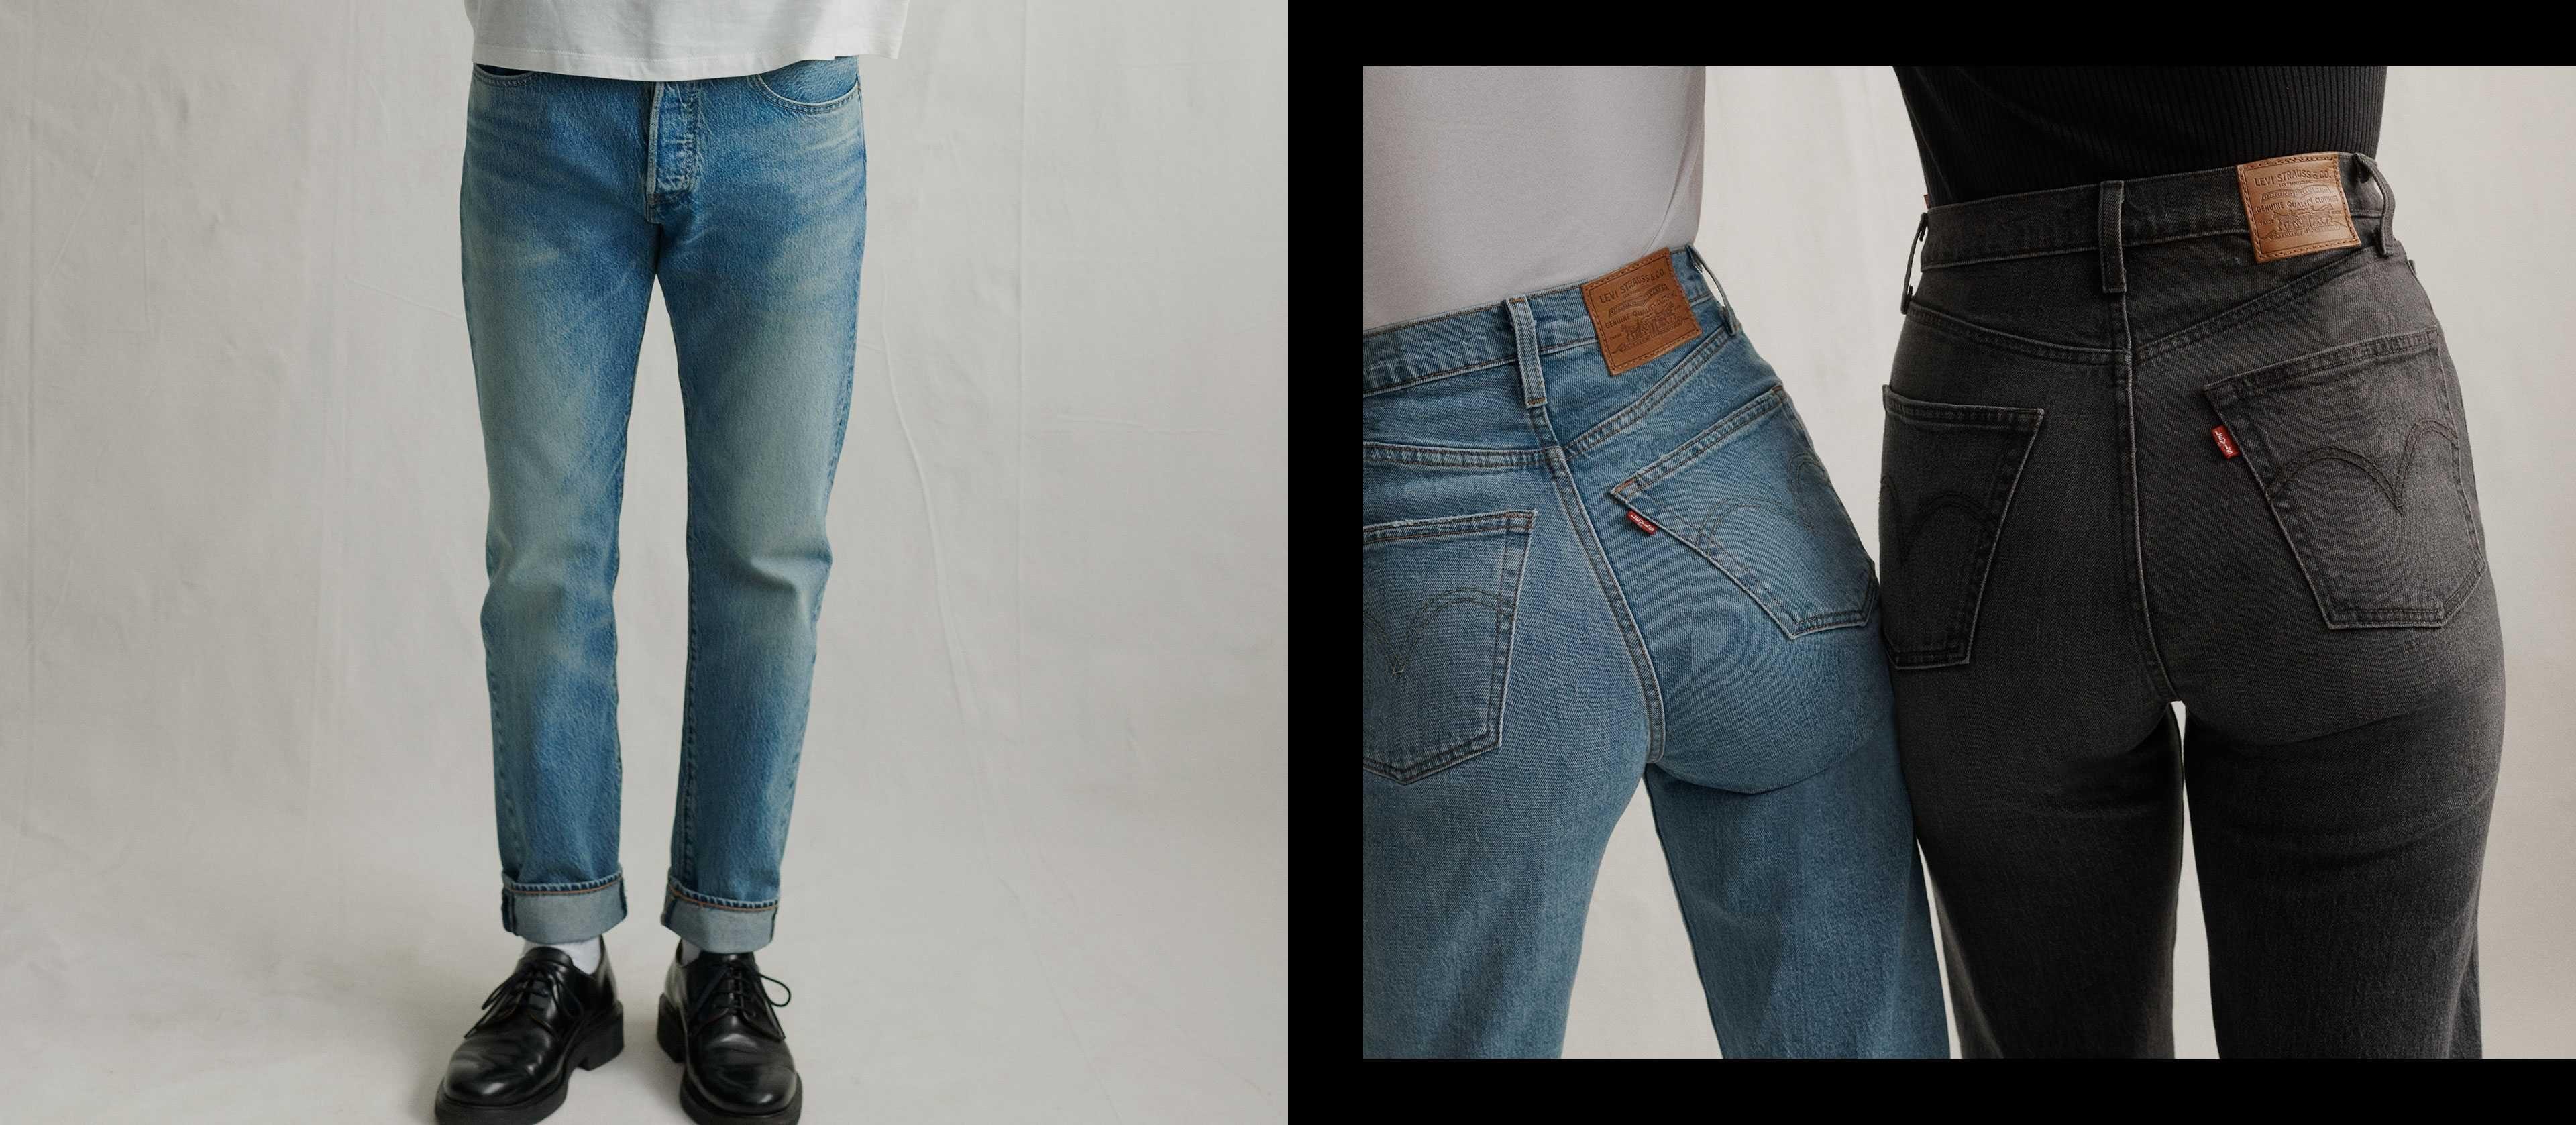 Lit 2 Places Moderne Inspirant Jeans Denim Jackets & Clothing